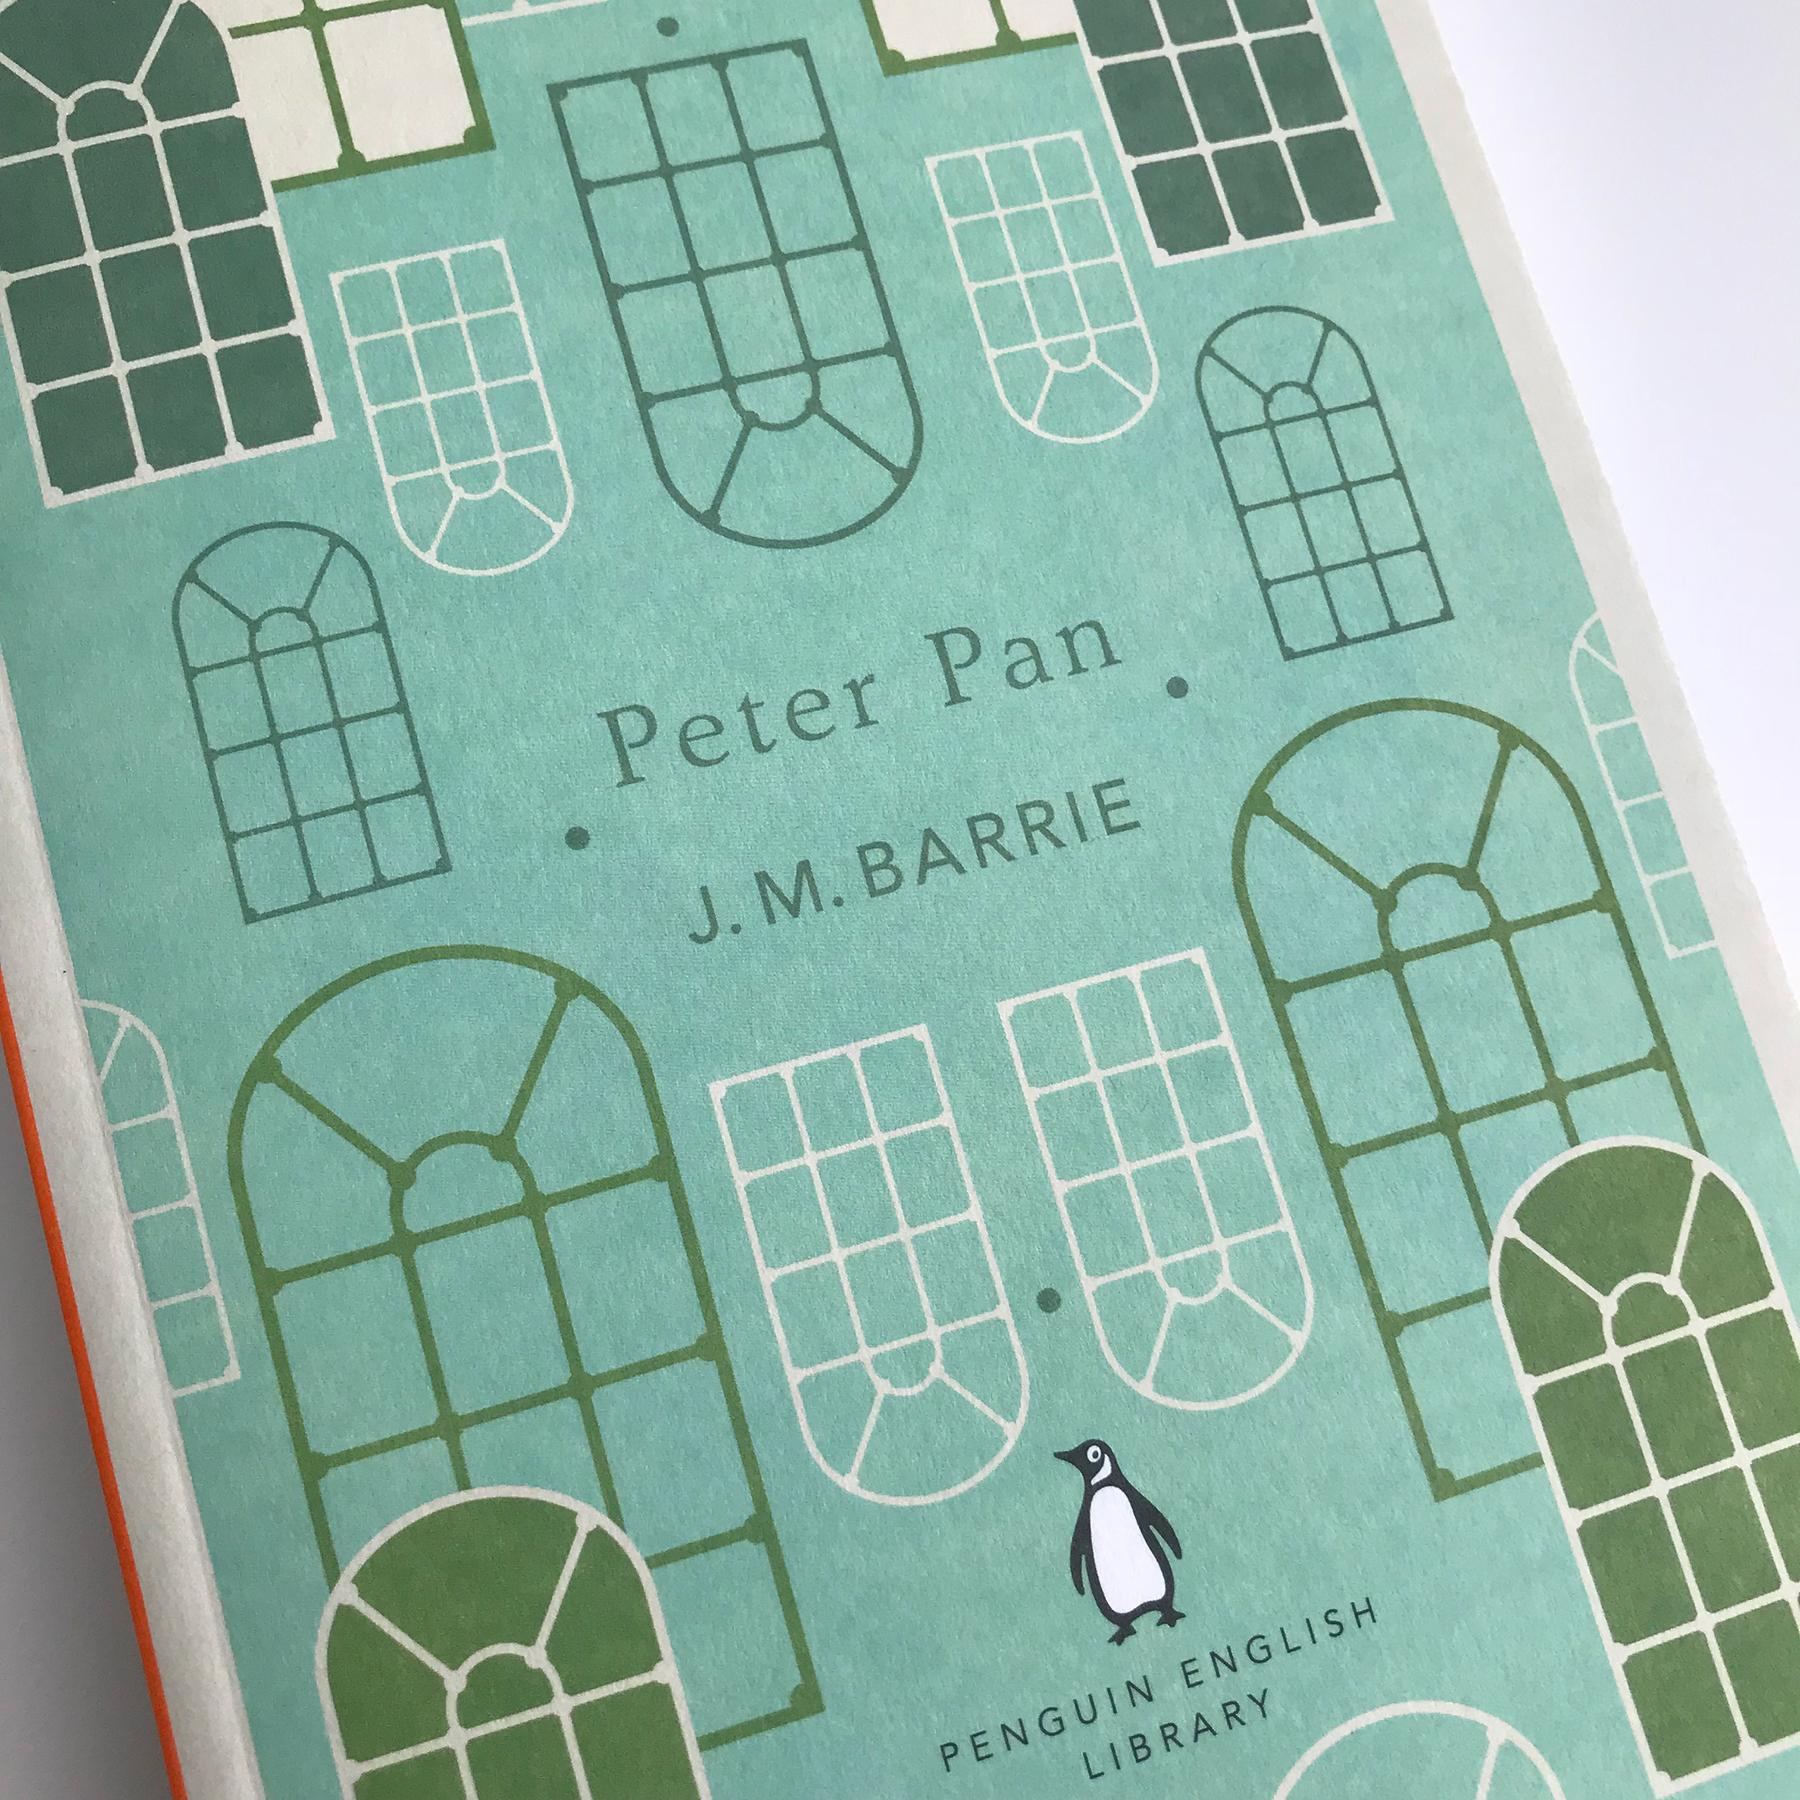 PEL Peter Pan JMBarrie